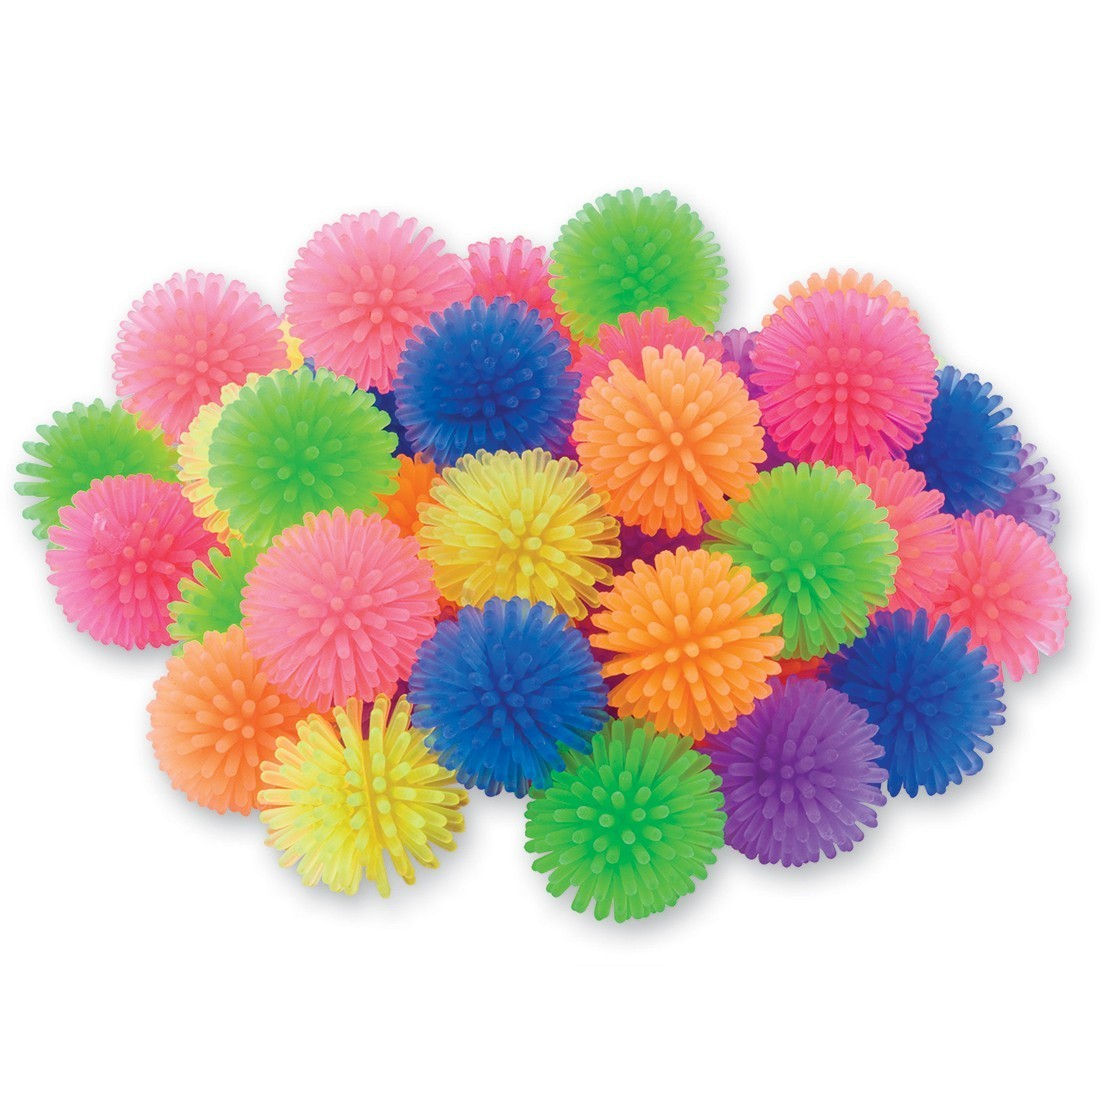 Spike Balls [image]